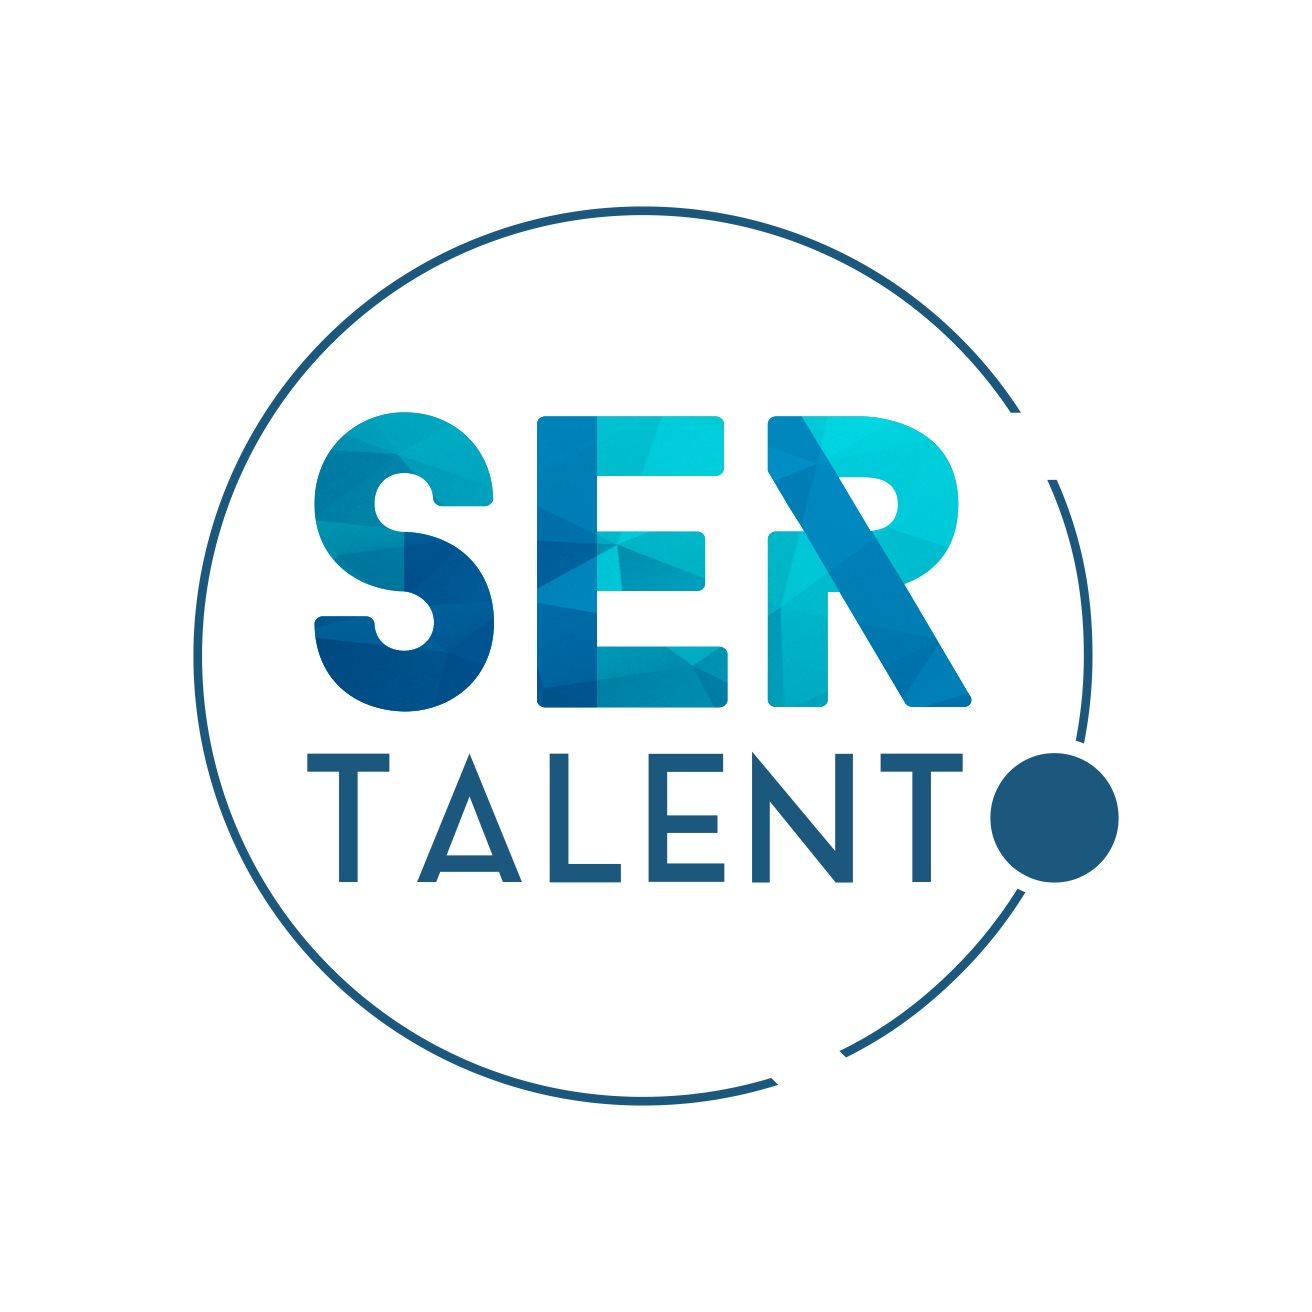 Ser Talento consultores